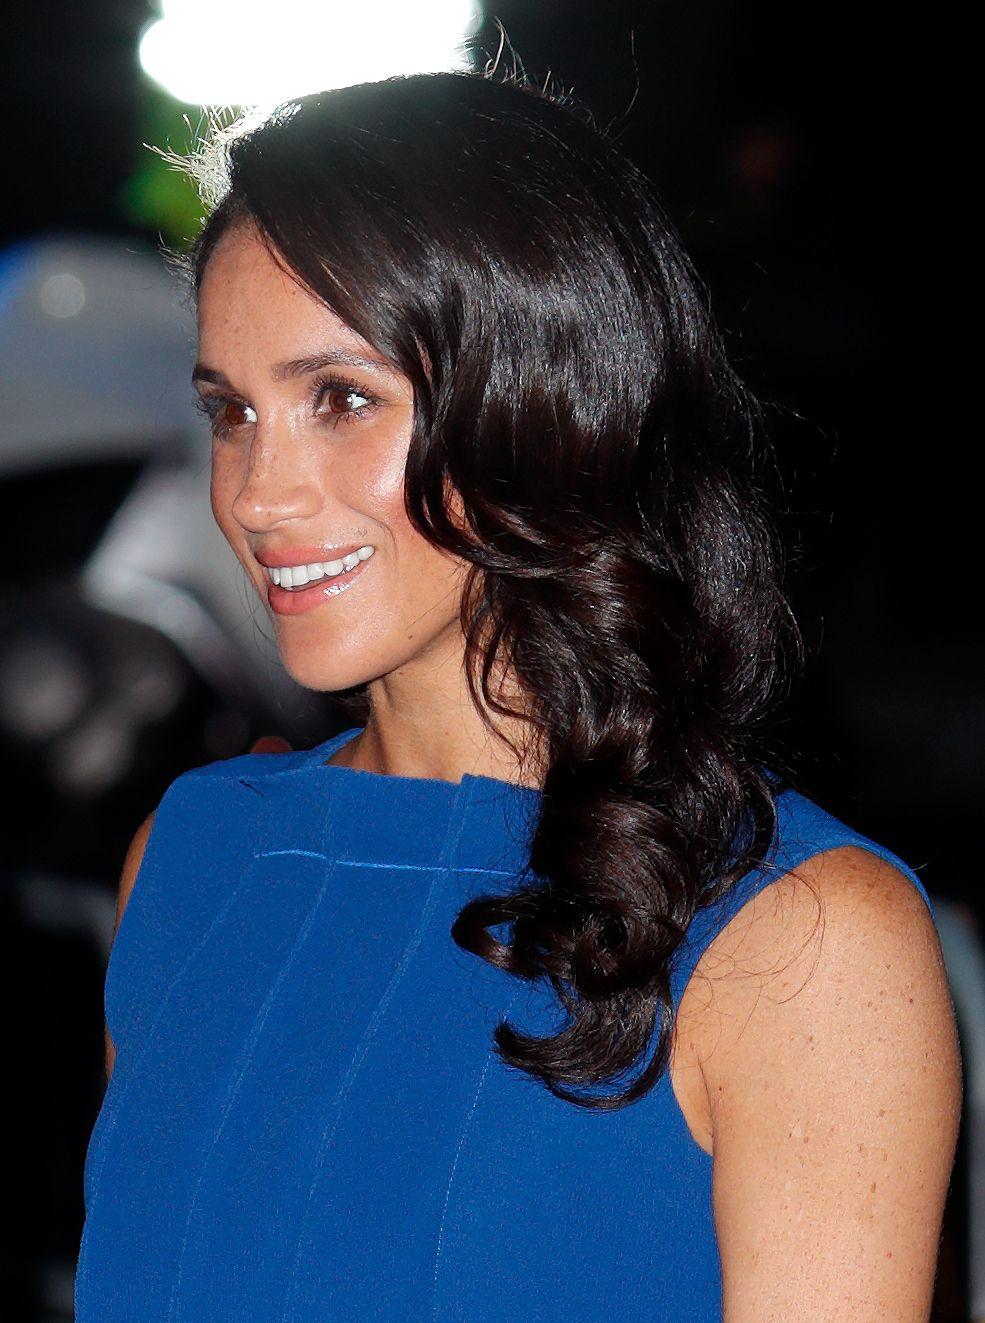 Hang on, Meghan Markle is actually a Princess?